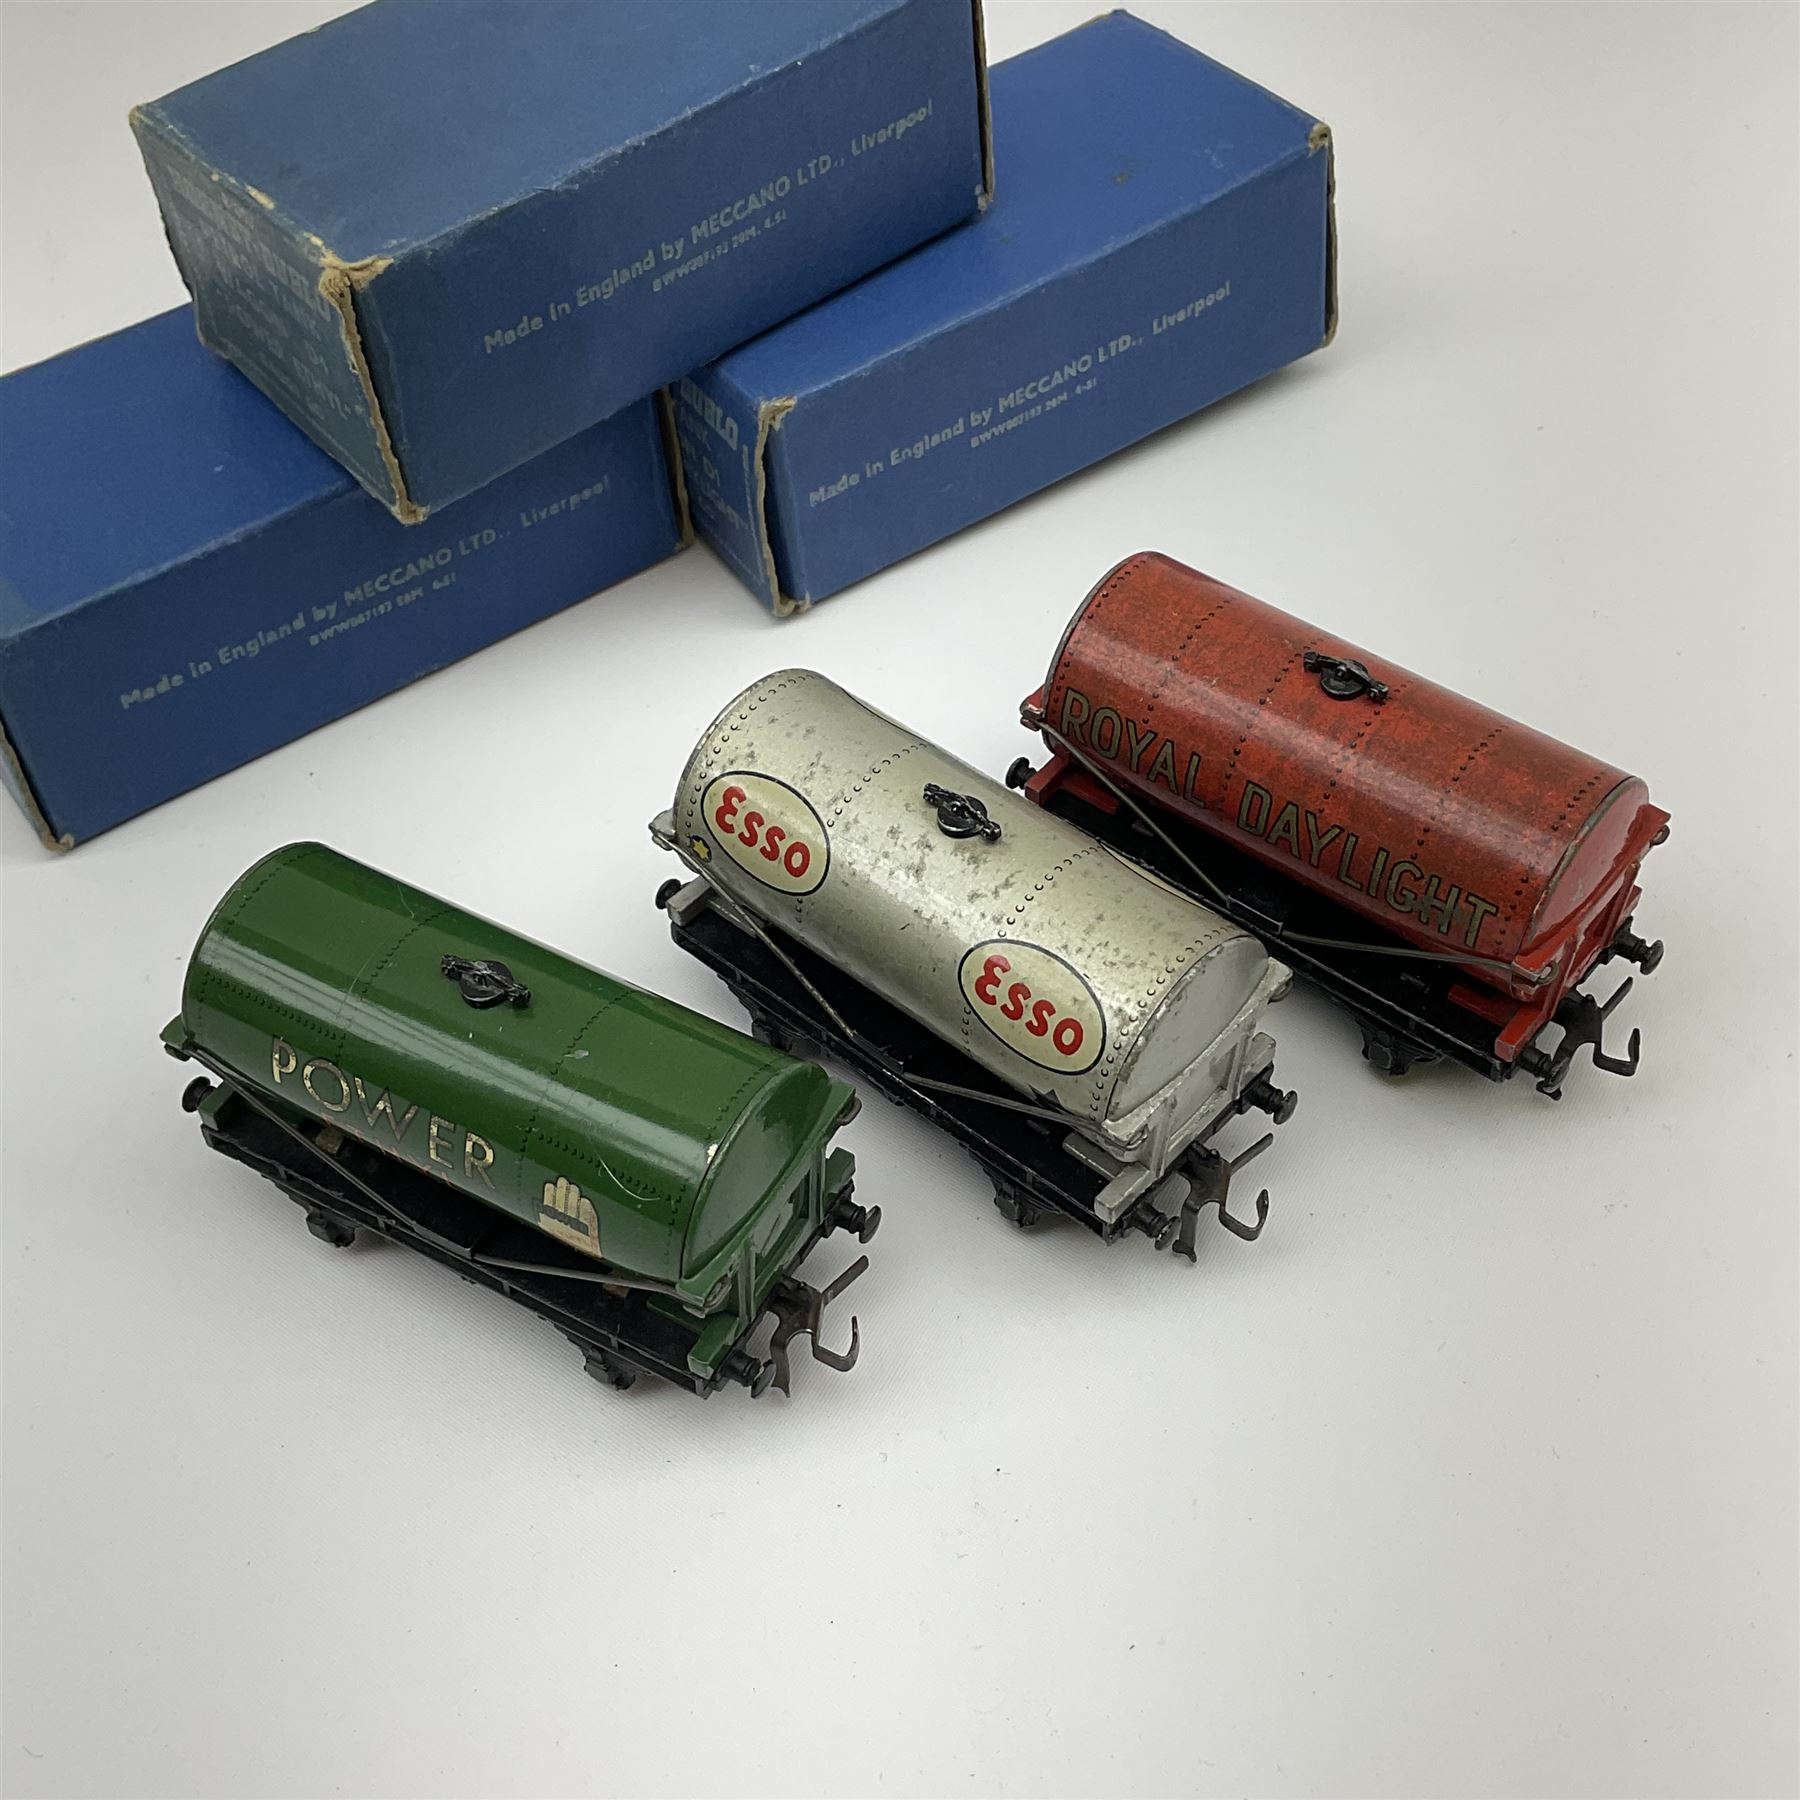 Hornby Dublo - Petrol Tank Wagon D1 'Power Ethyl'; Oil Tank Wagon D1 'Royal Daylight'; and Petrol Ta - Image 3 of 3